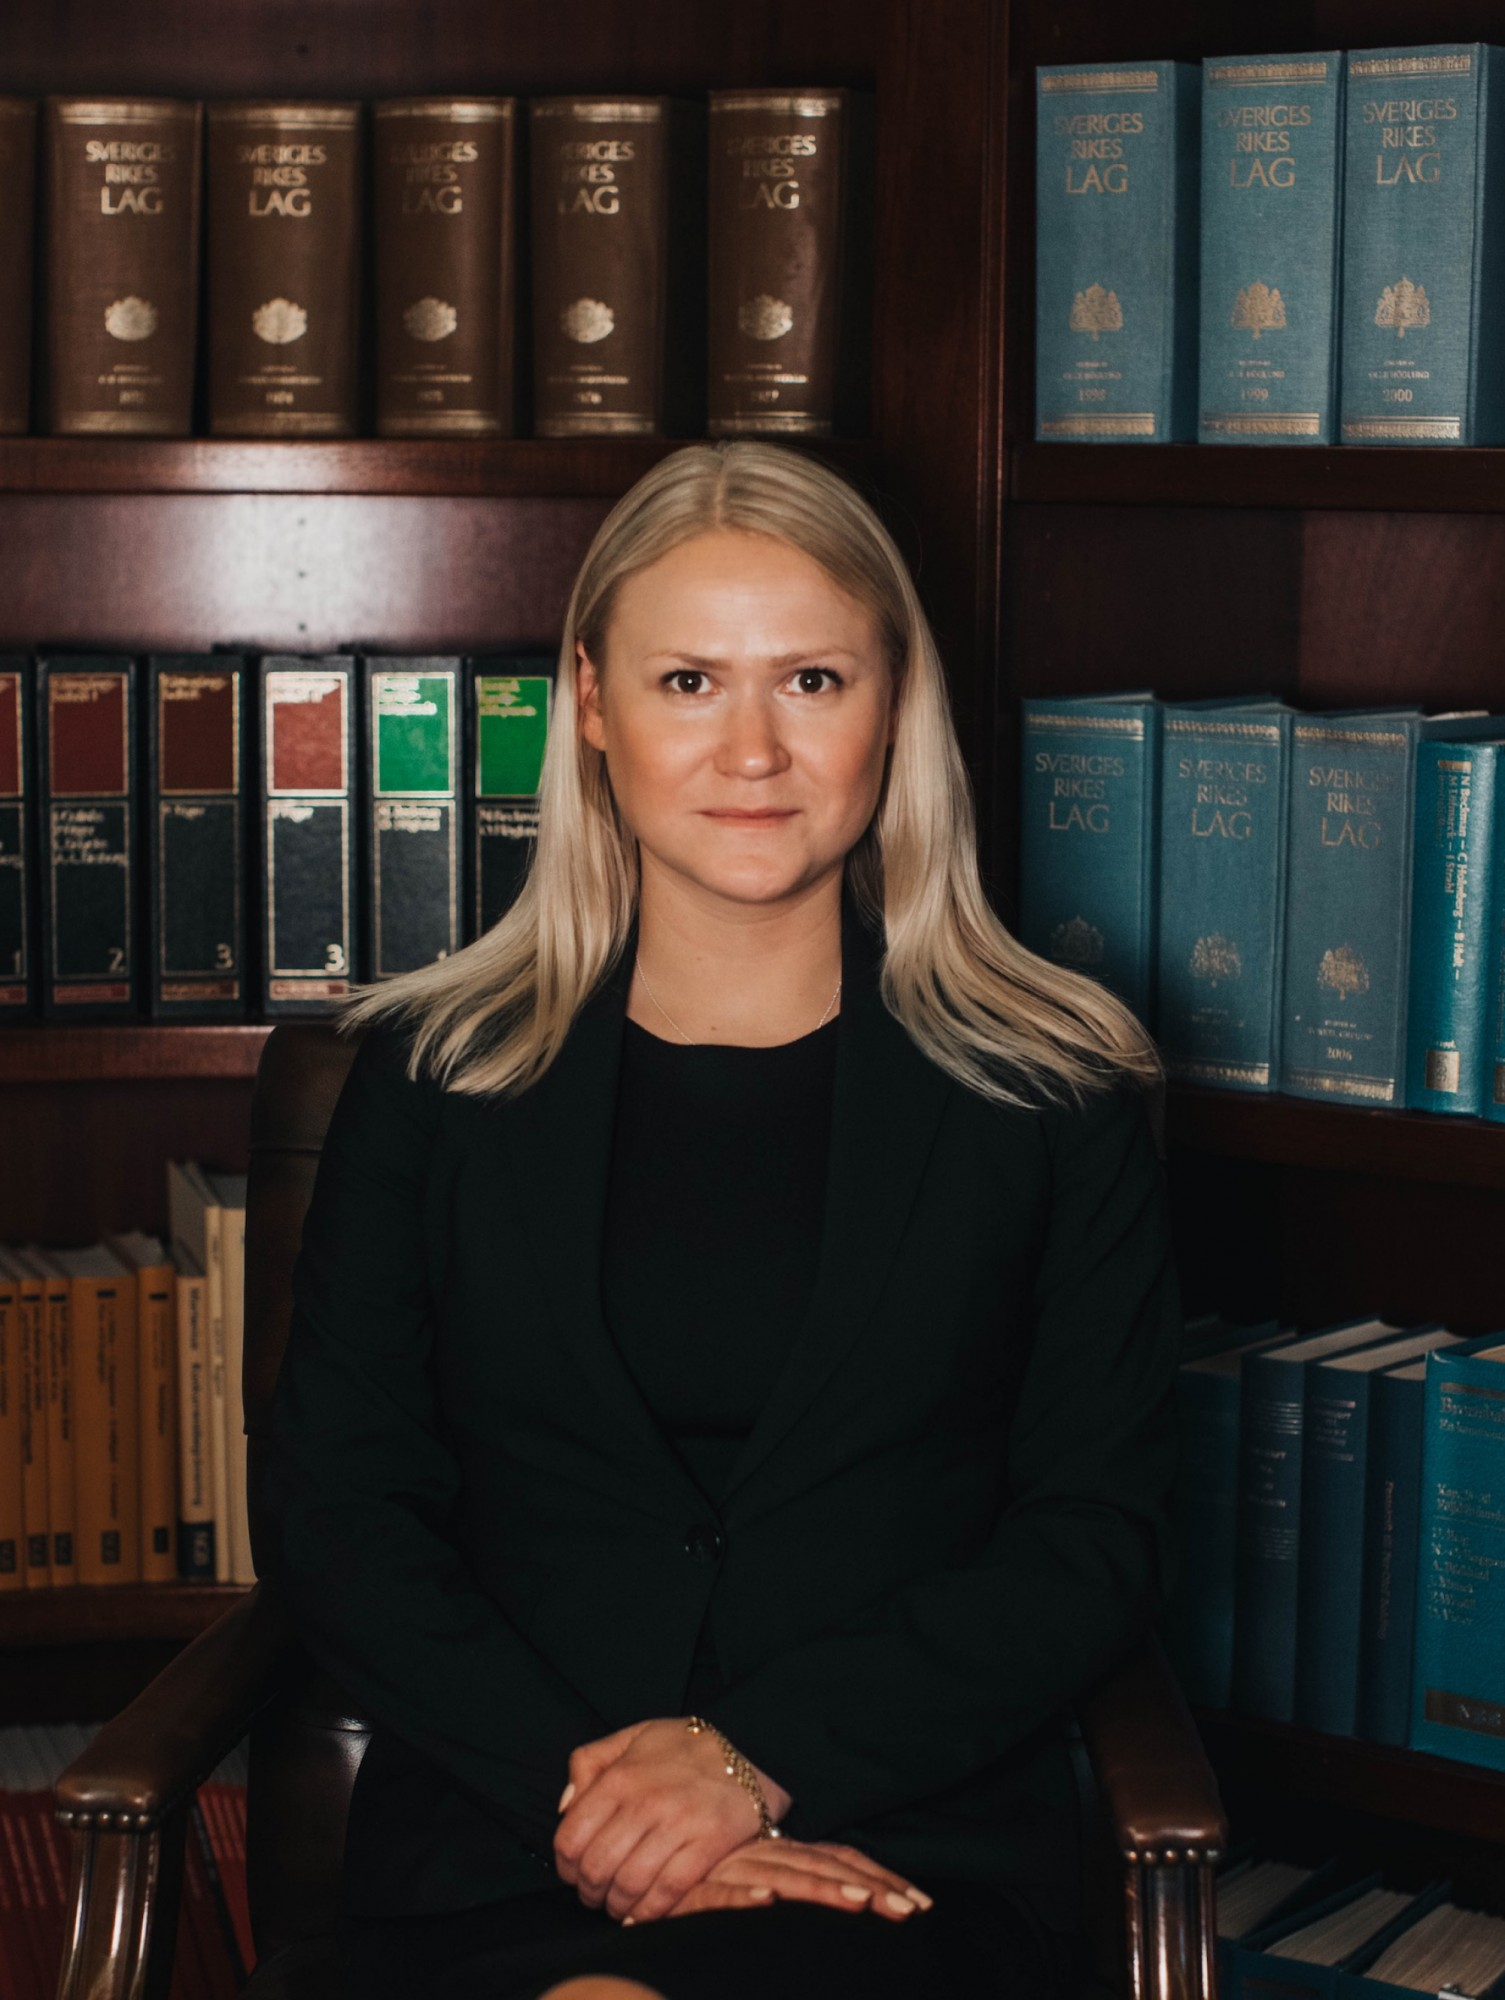 Lina Modig